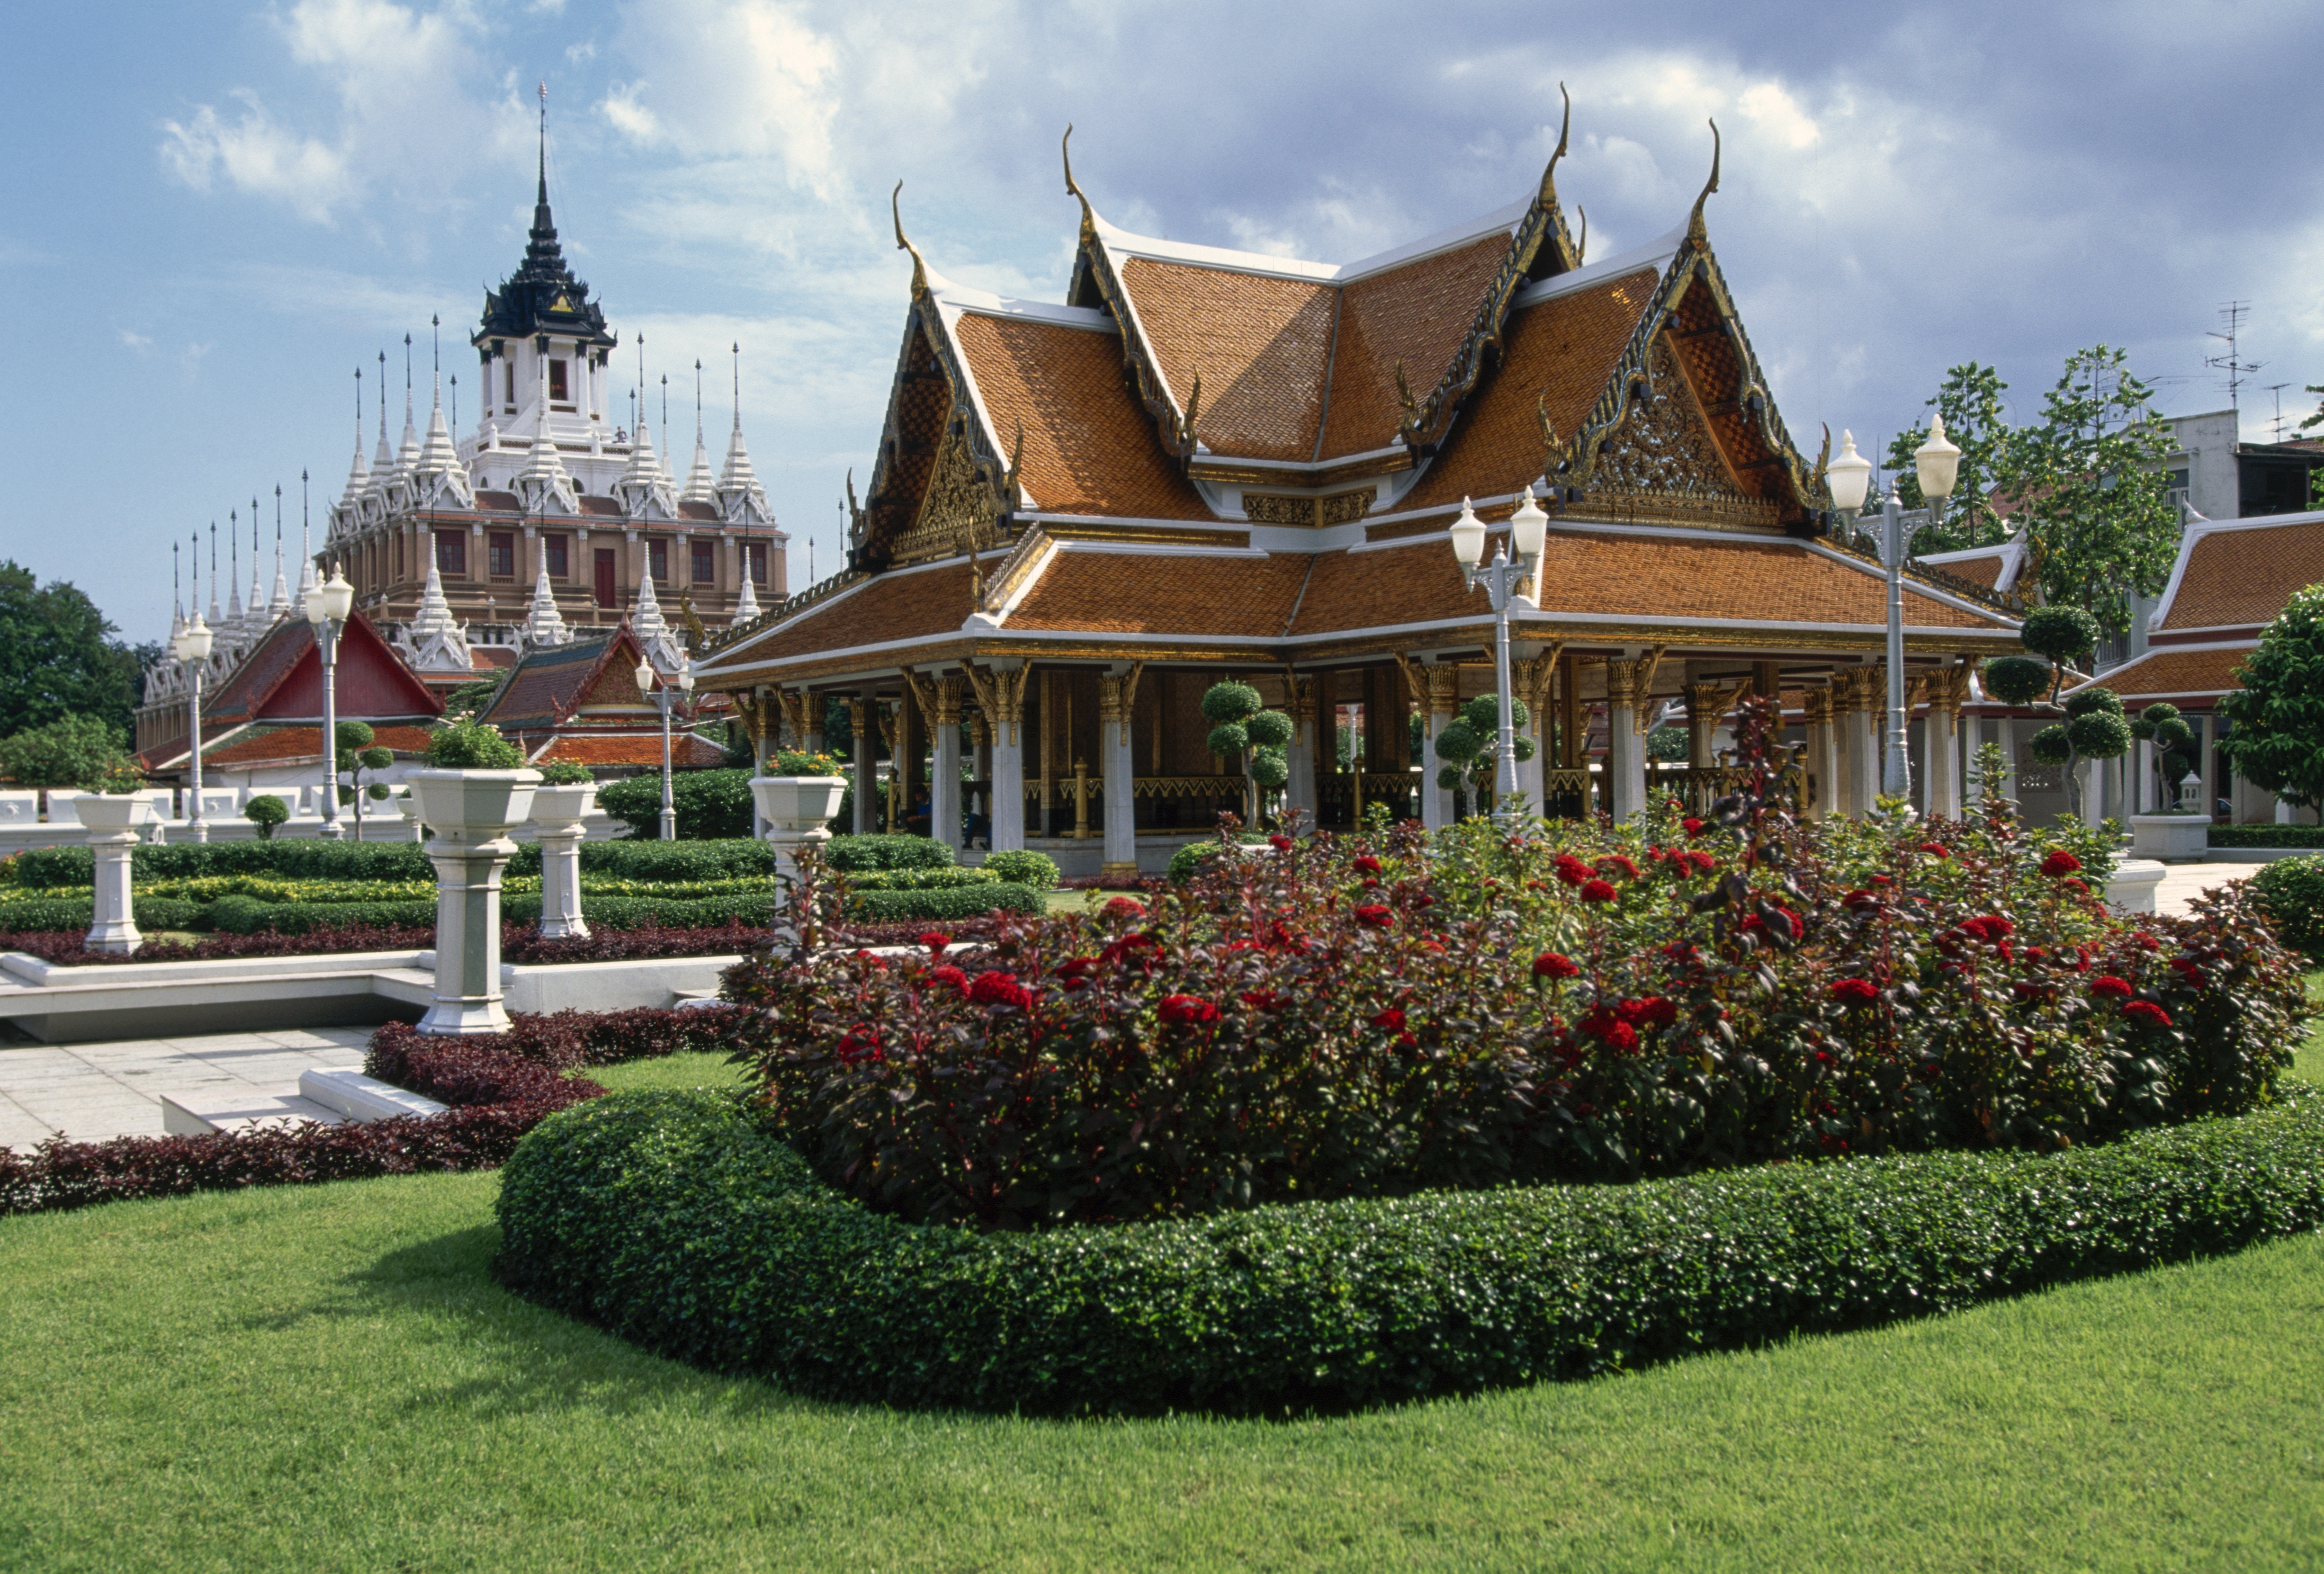 THAILAND - FEBRUARY 9: Royal Pavilion Mahajetsadabadin, with the Wat Ratchanatdaram temple on the left, park dedicated to King Rama III (1788-1851), Bangkok, Thailand. (Photo by DeAgostini/Getty Images)